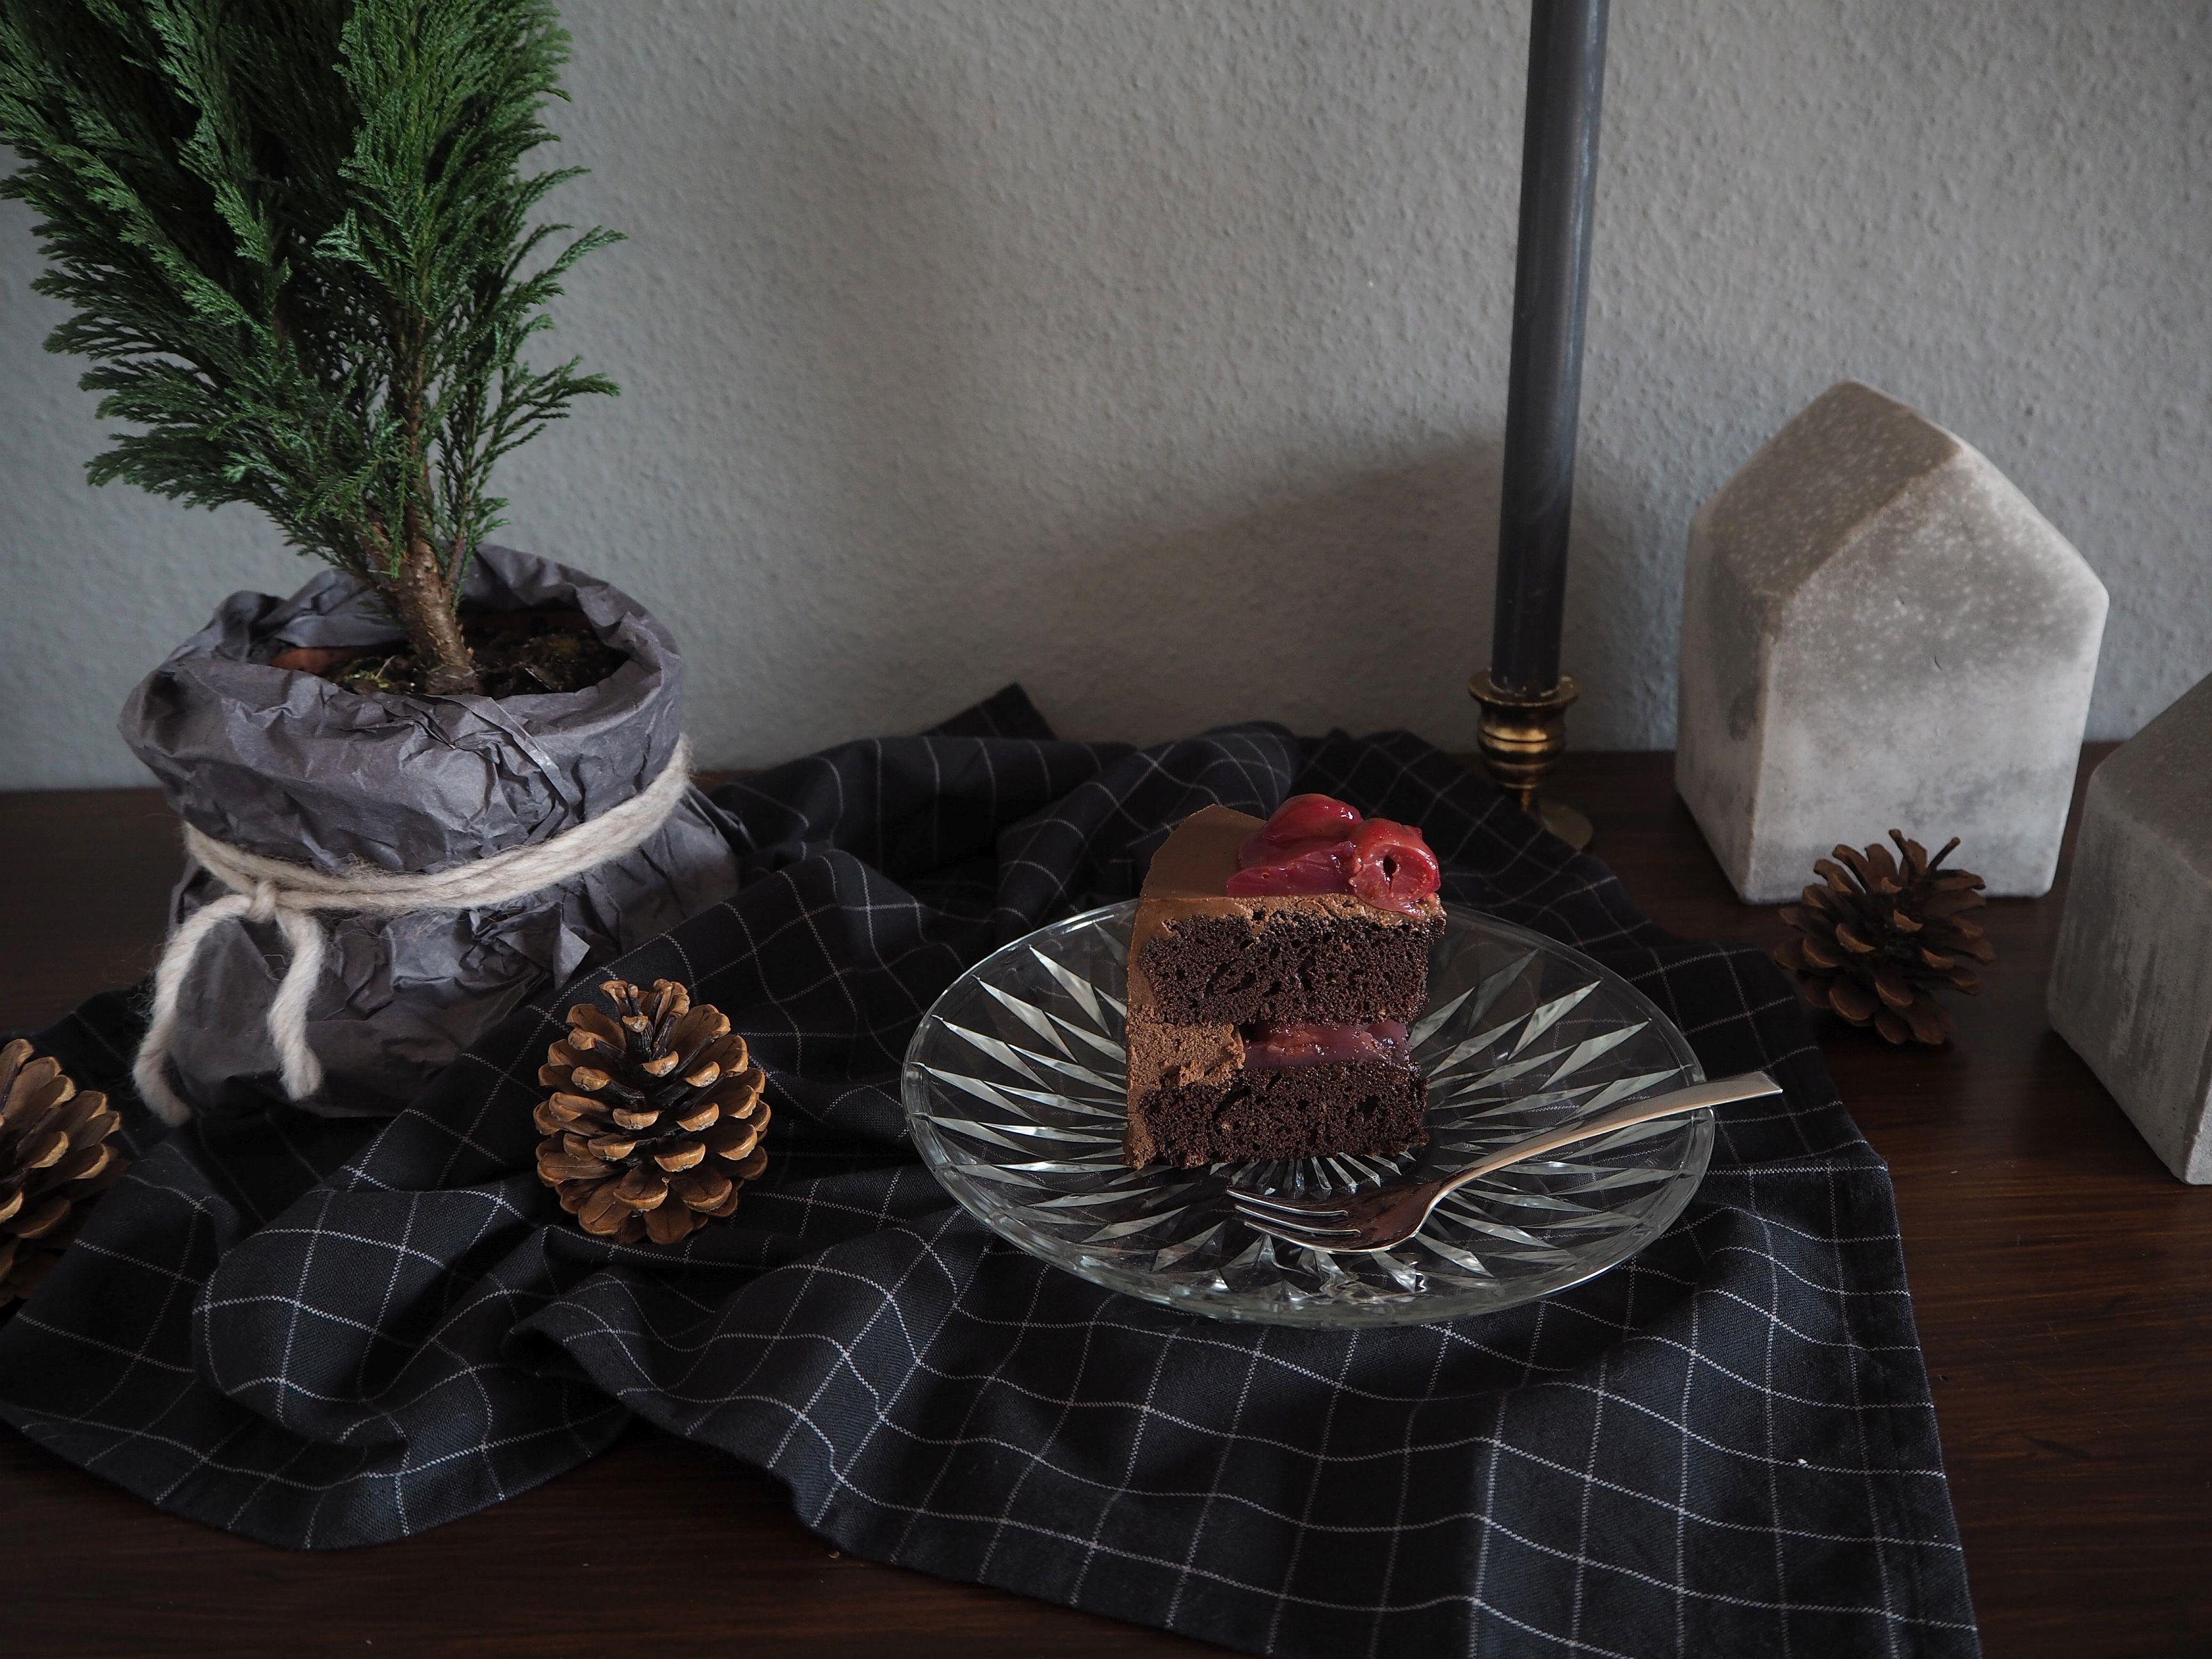 2017-12-skoen-och-kreativ-adventskalender-cookie-and-cake-love-chocolate-cherry-cake (8)